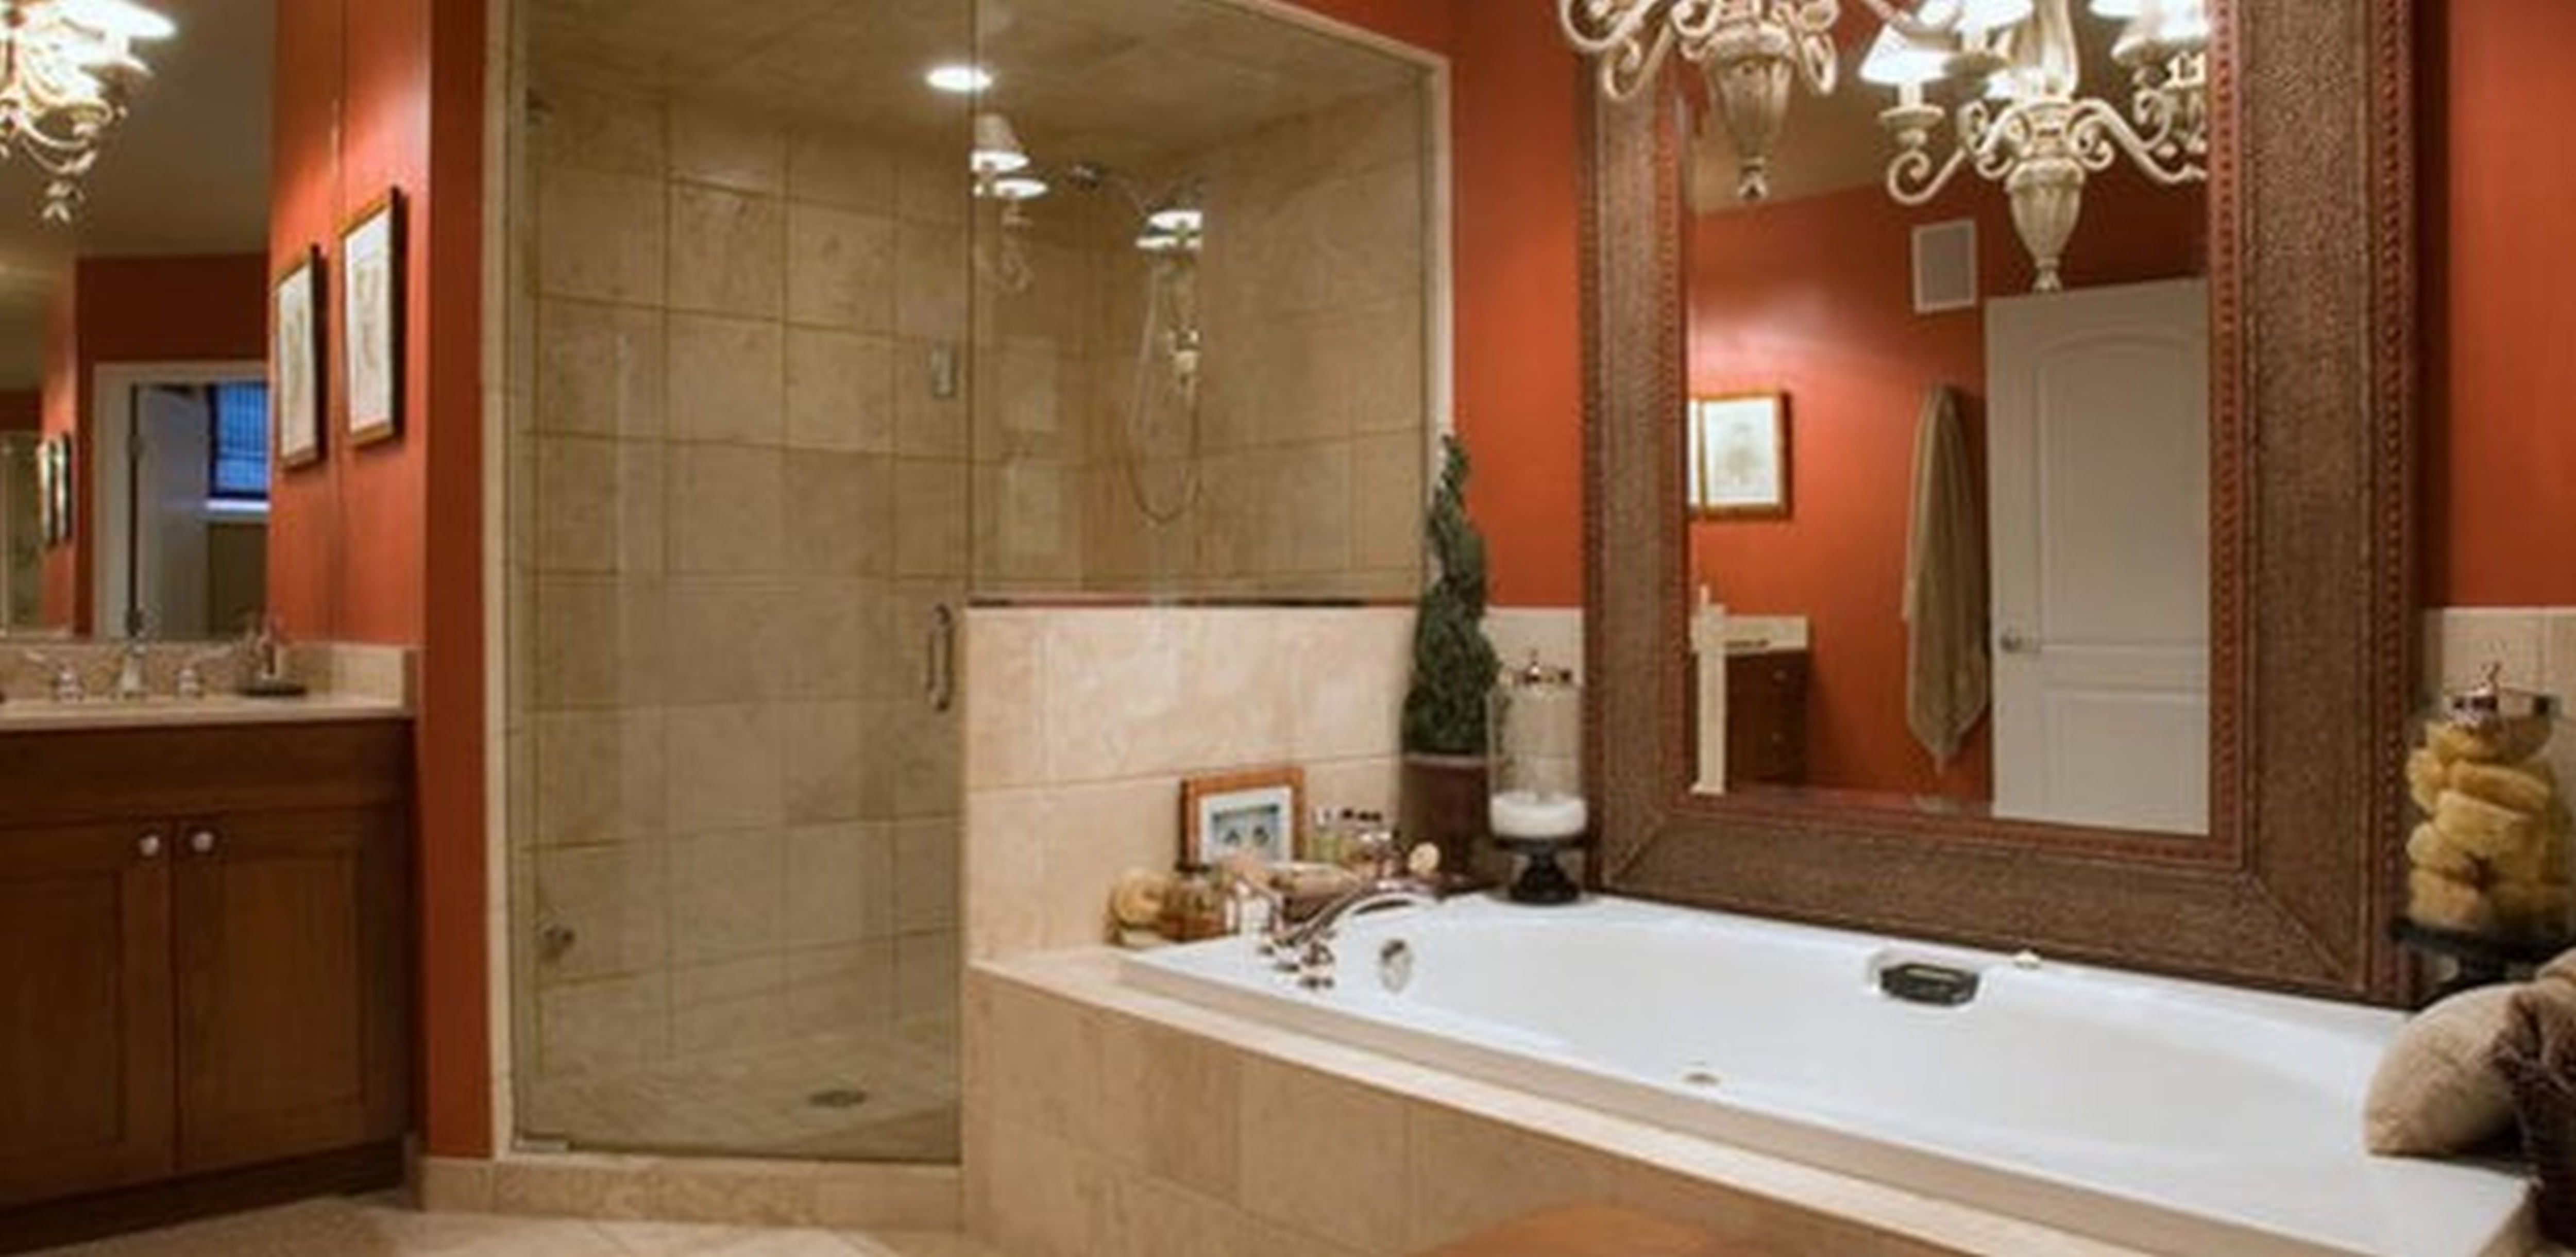 Bathroom Paint Color Ideas For Small Bathrooms Colors